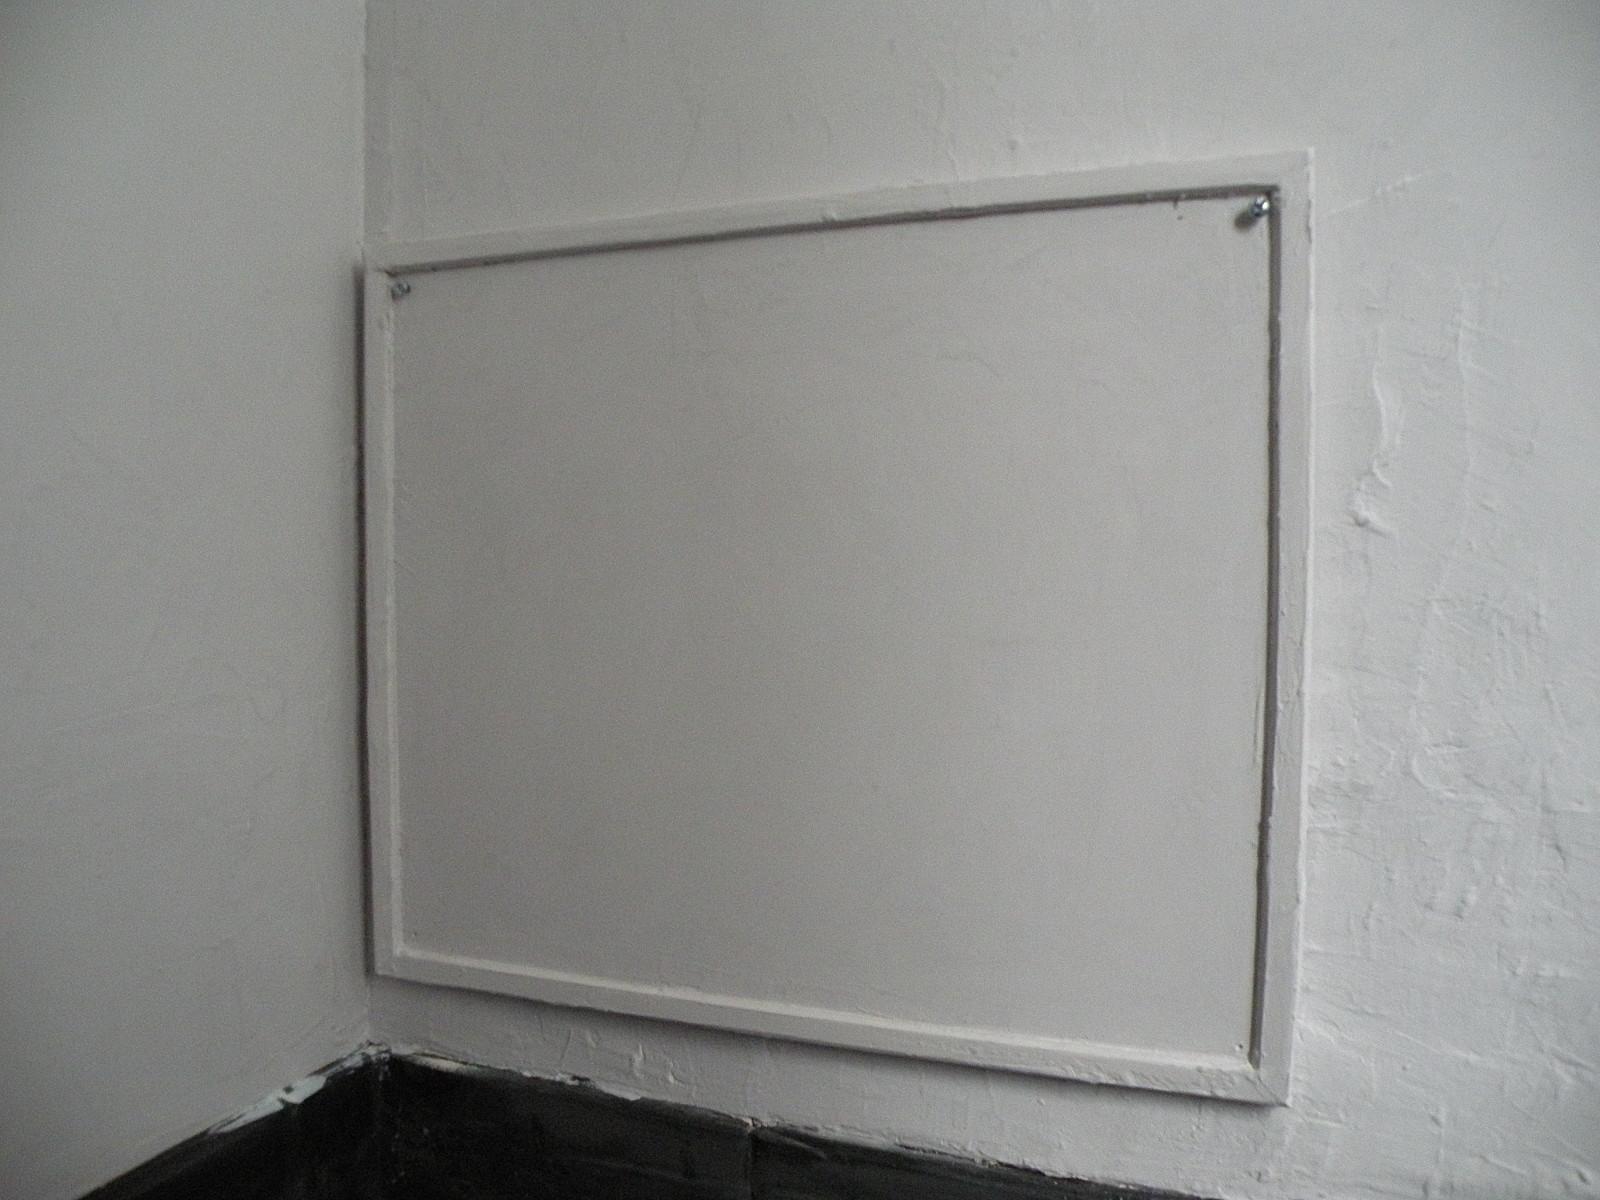 dans le r u00e9tro   les murs de la salle de bain